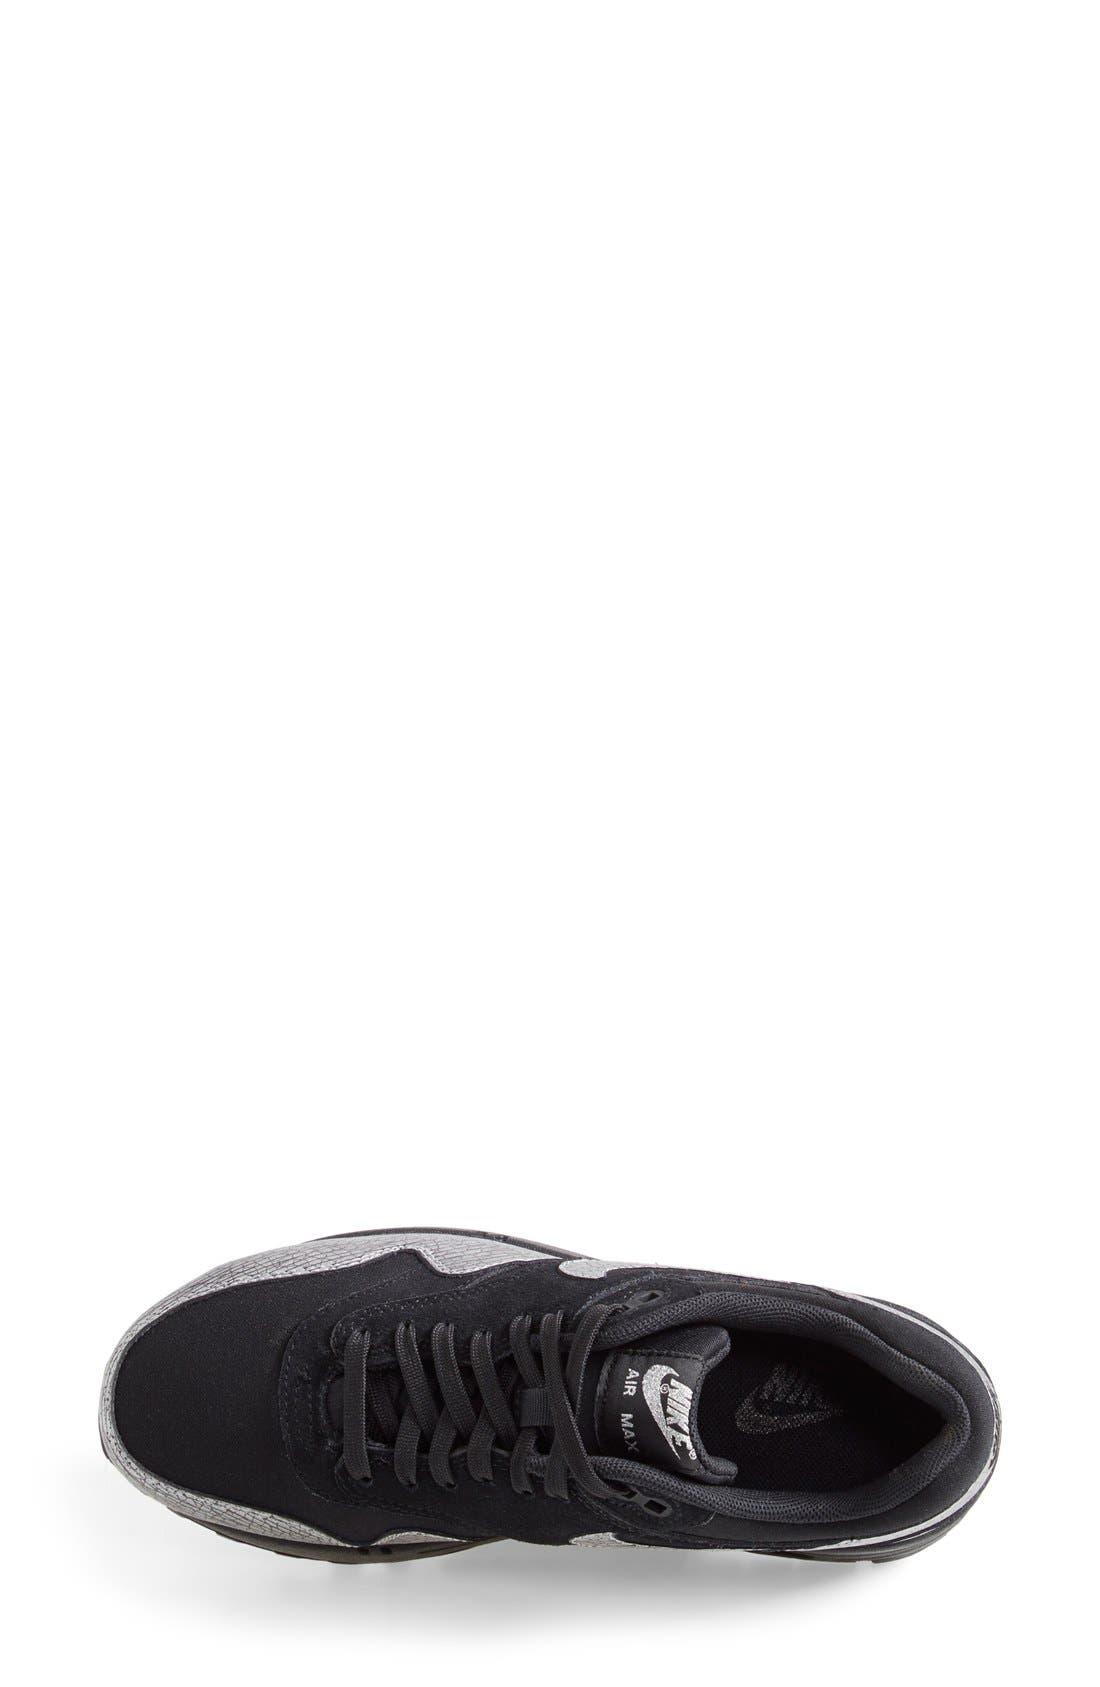 NIKE, 'Air Max 1 Vintage' Sneakers, Alternate thumbnail 3, color, 005